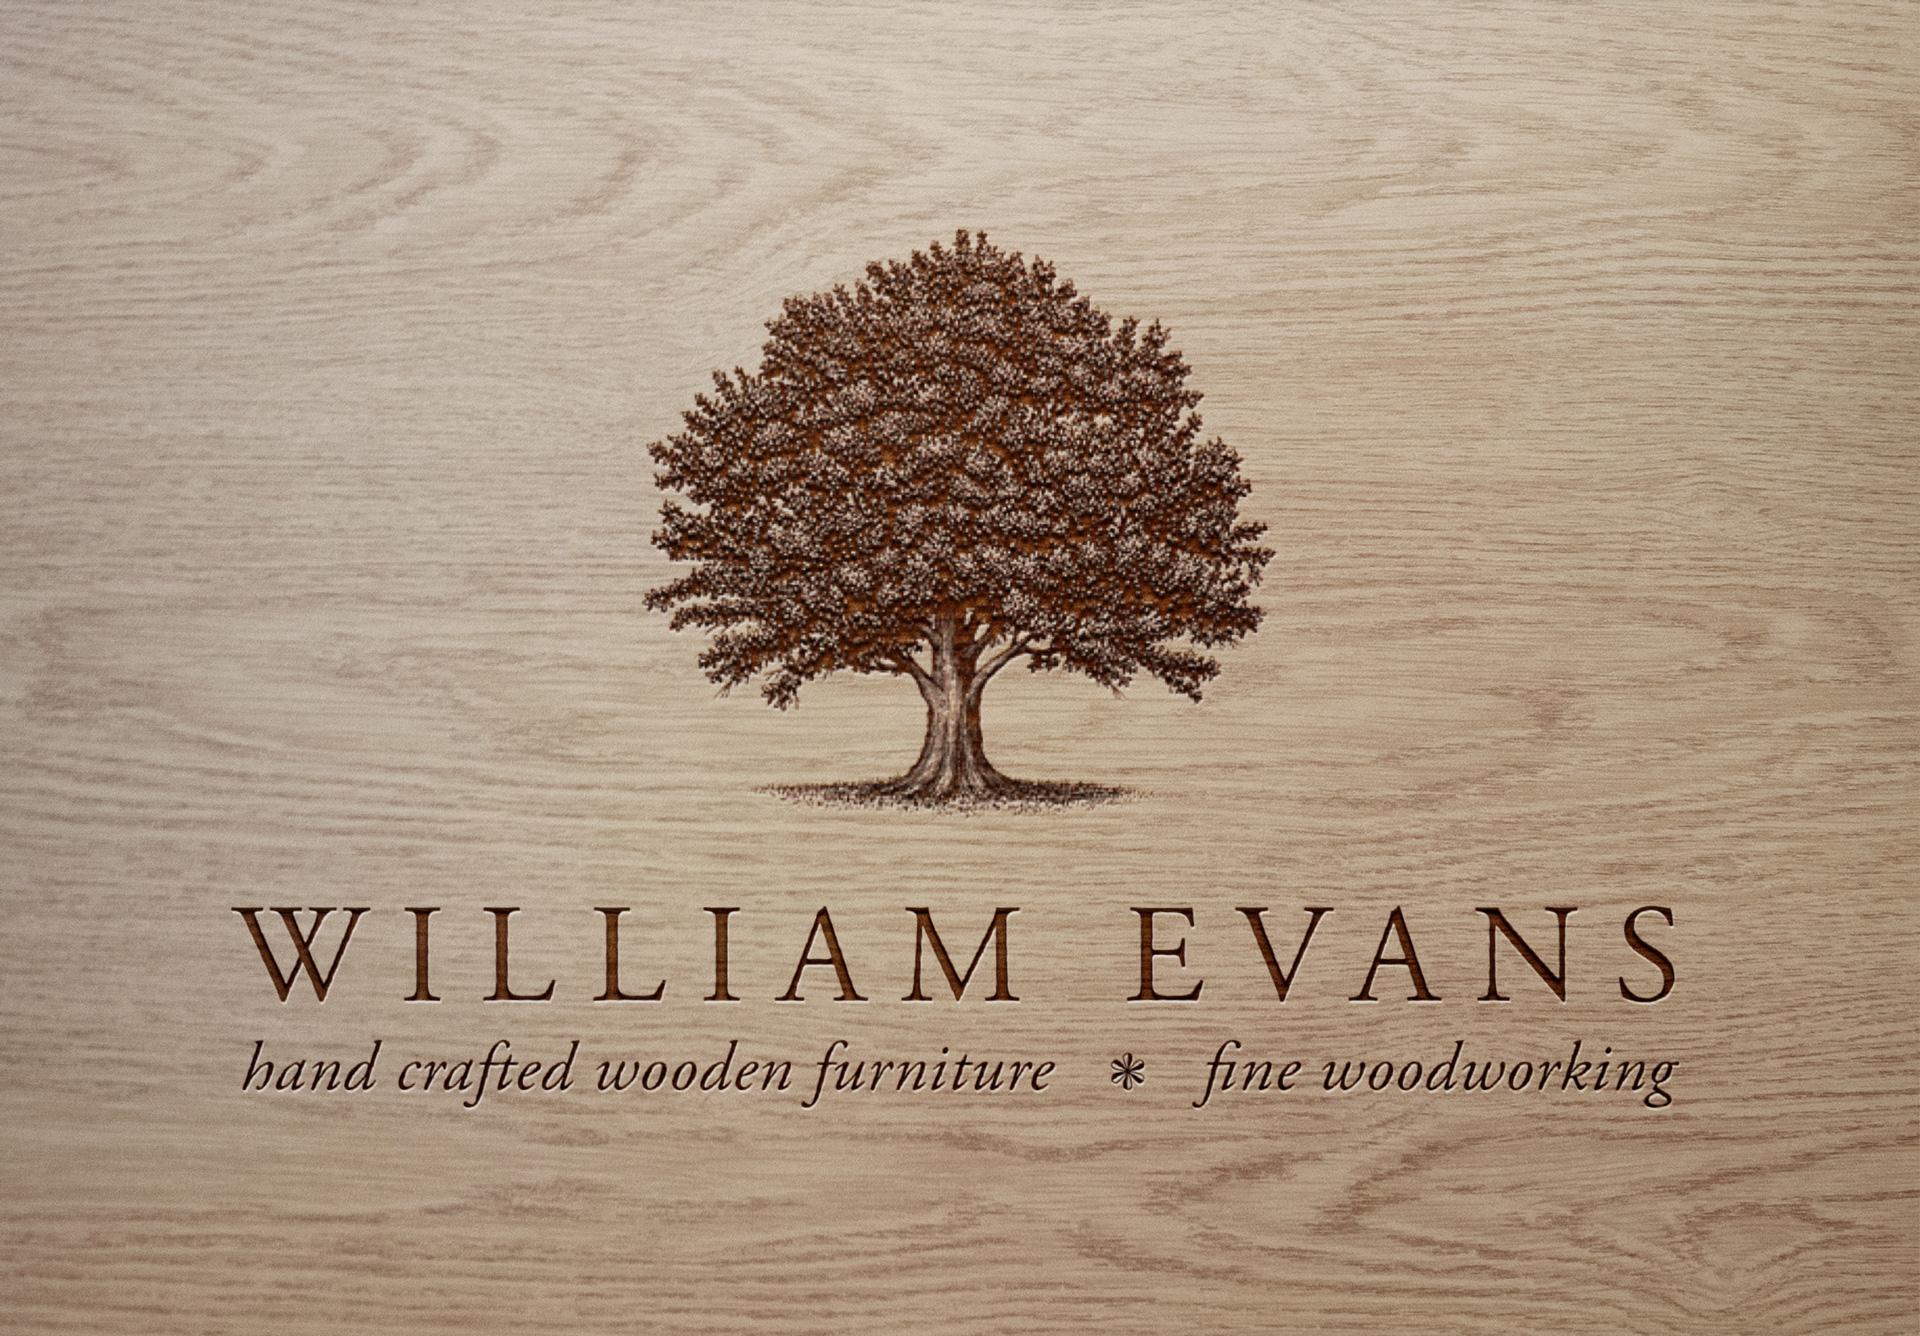 William Evans Cabinetmaker